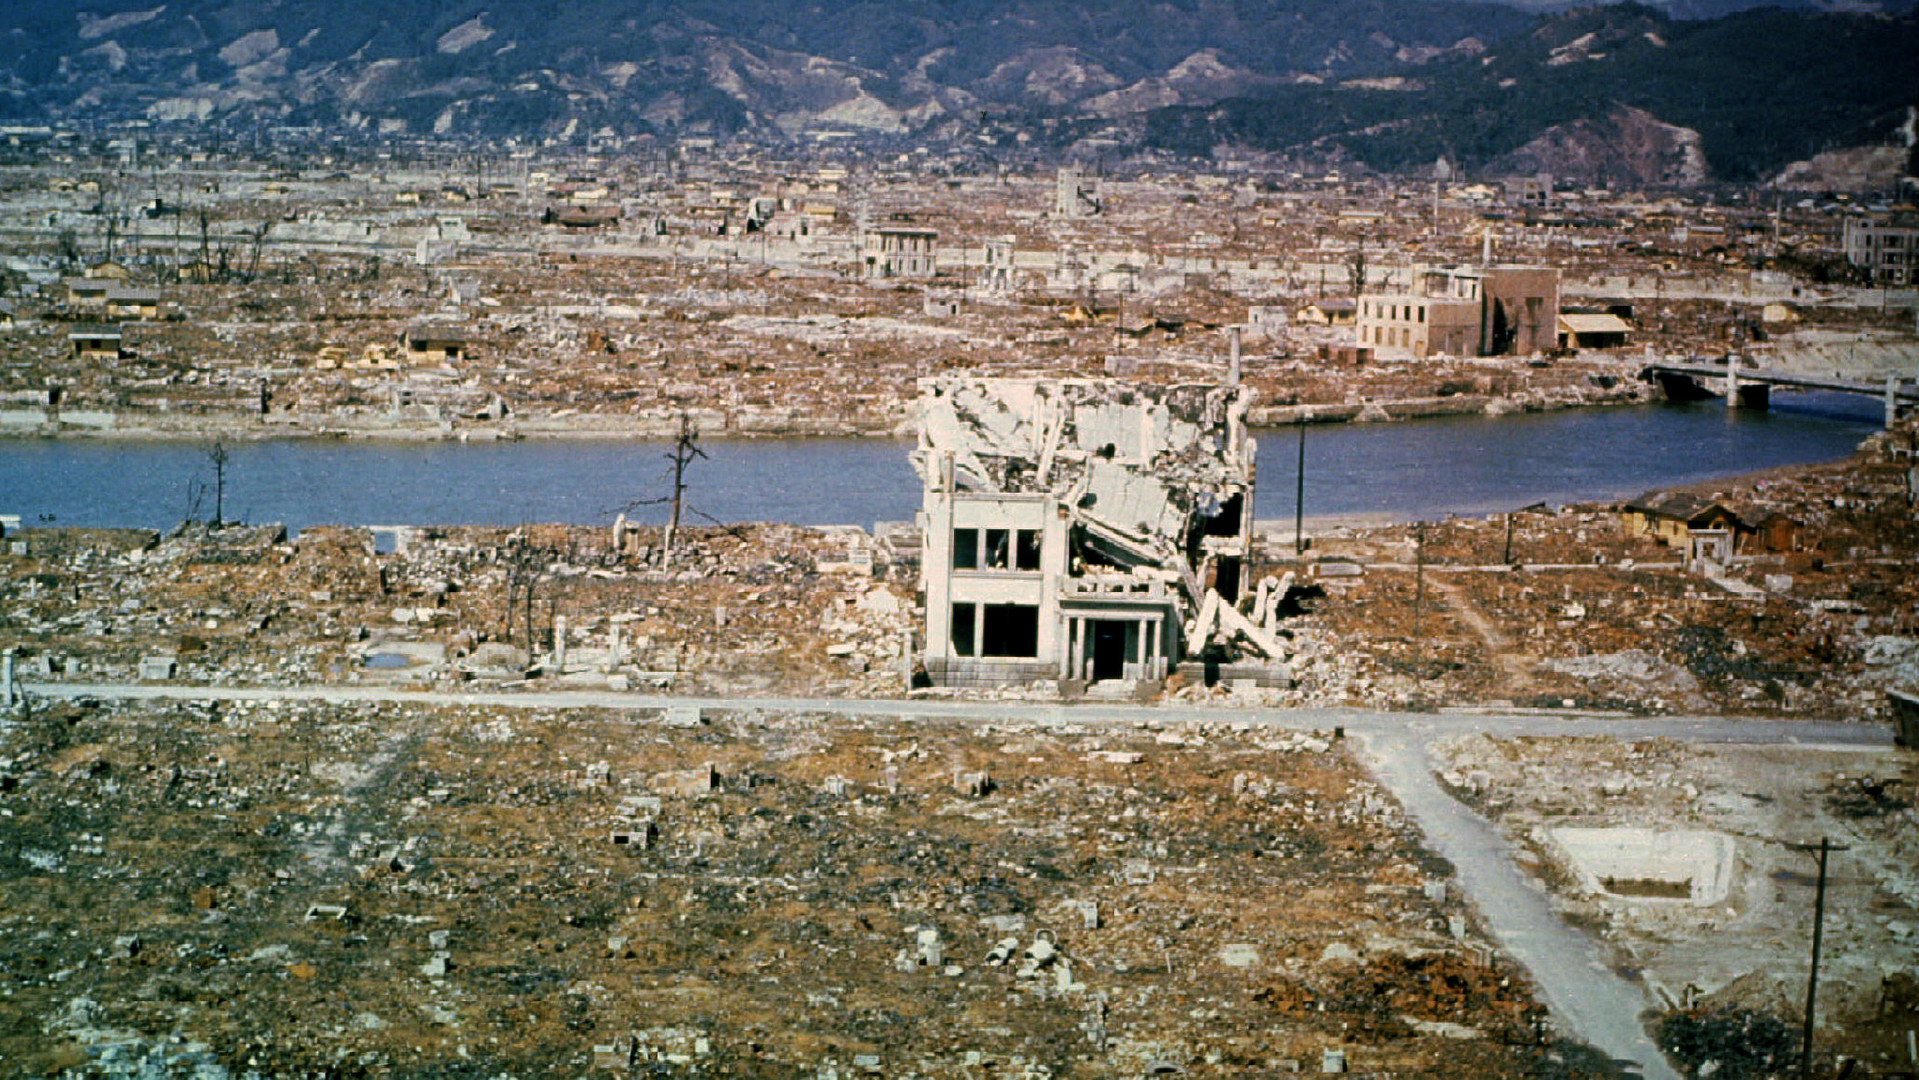 Hiroshima en 1946, six mois après le bombardement